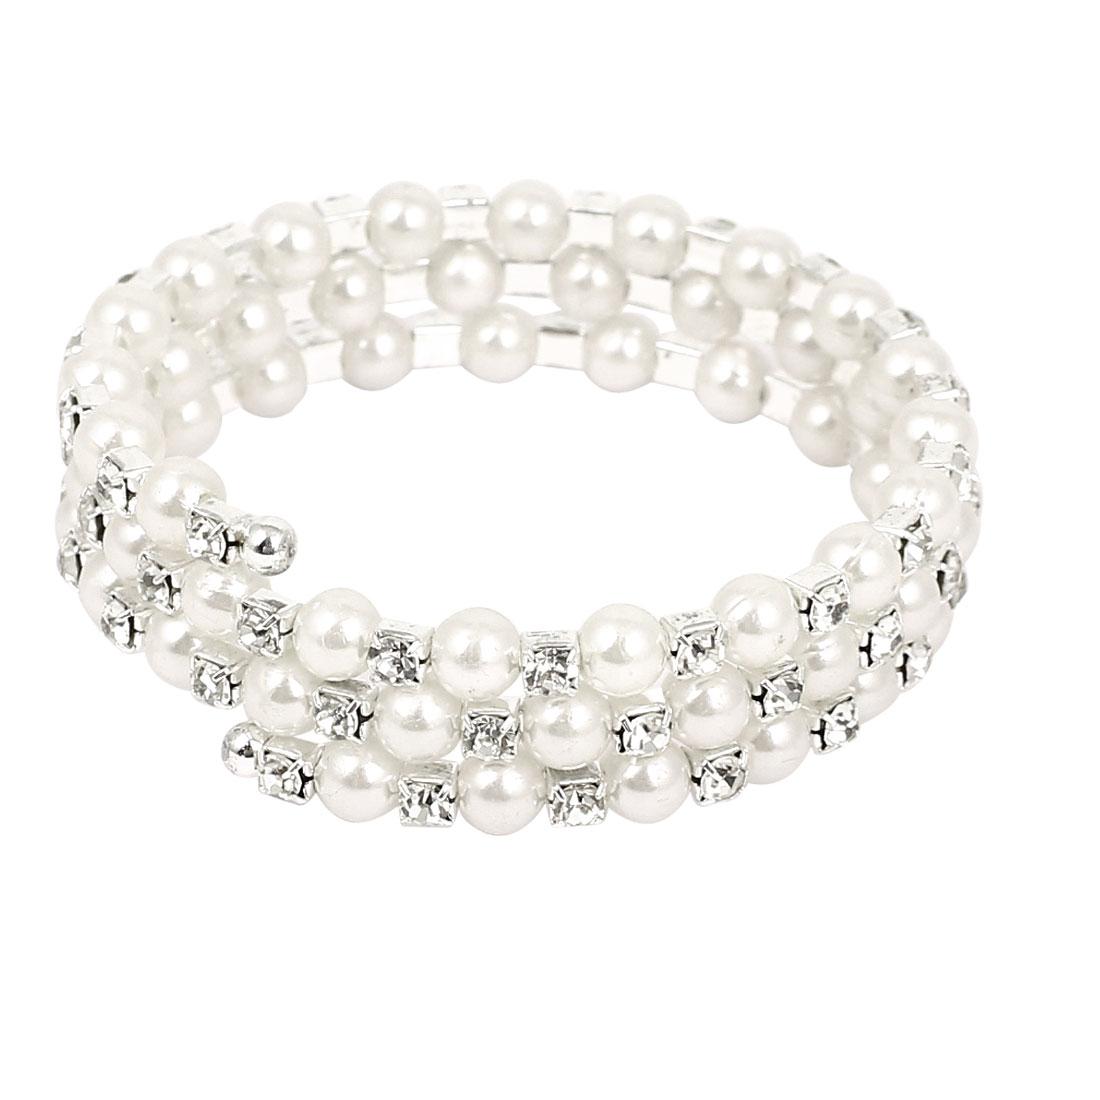 Lady Rhinestone Decor White Plastic Imitation Pearl Linked Sprial Wrist Charm Bracelet Bangle